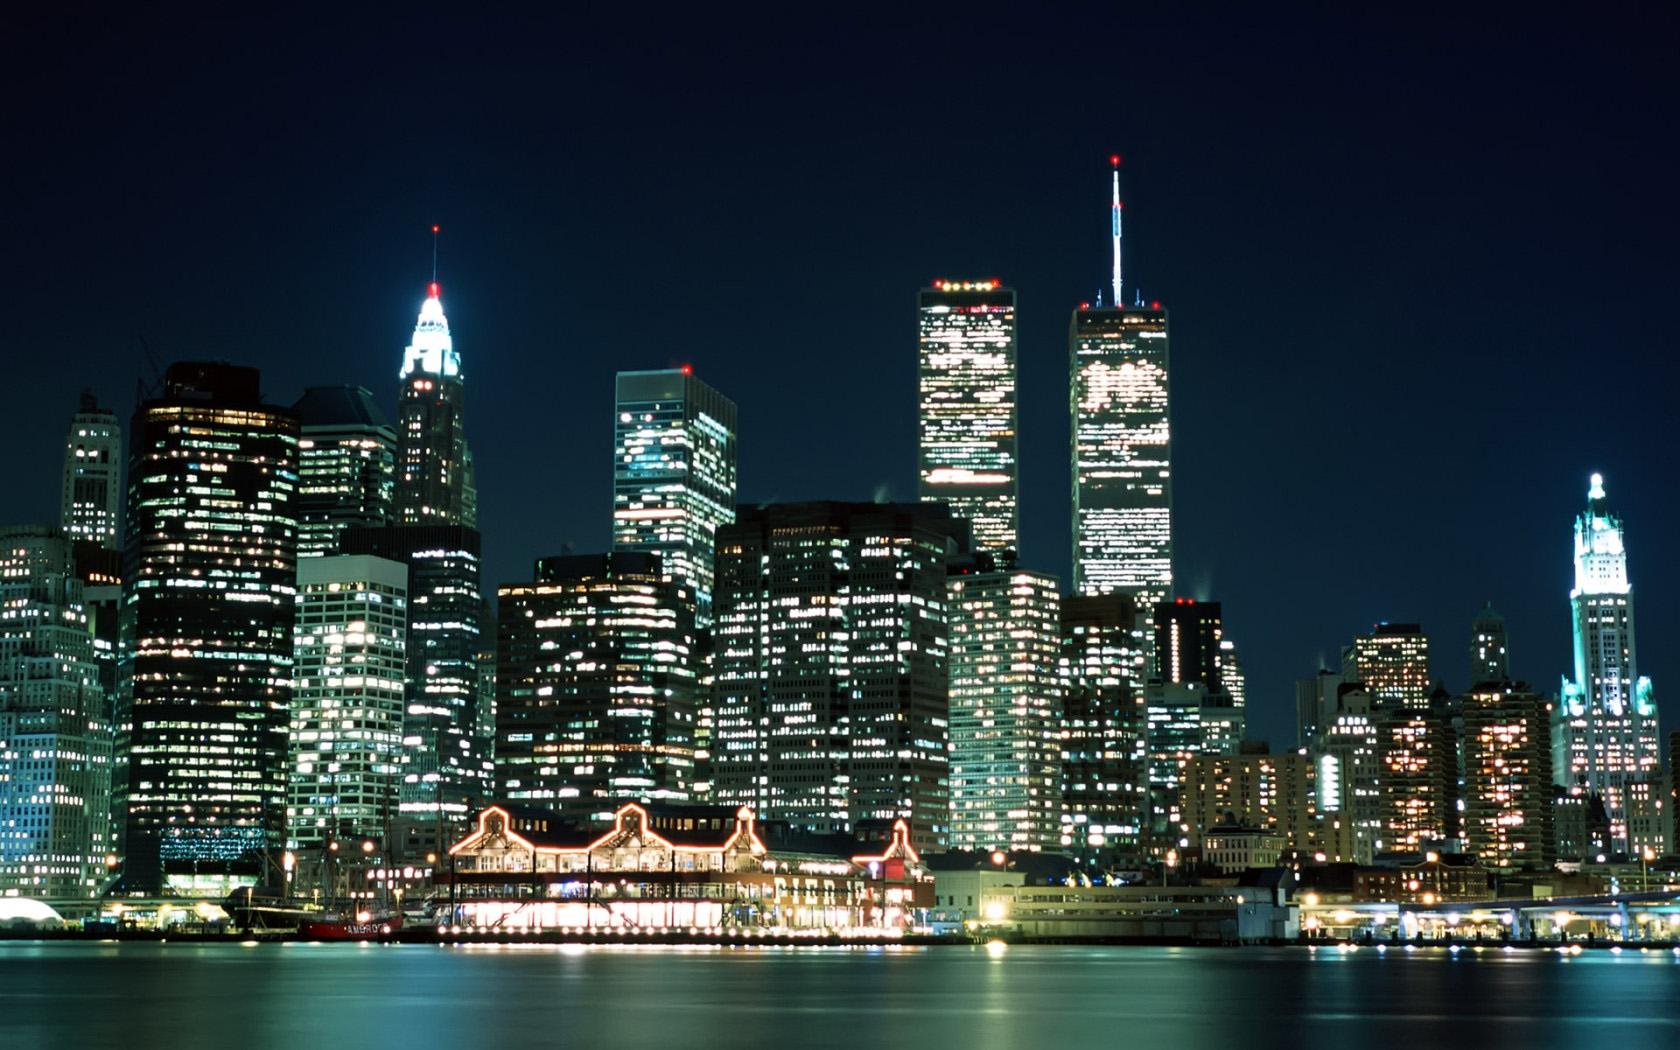 Free Download Manhattan Skyline At Night Wallpaper